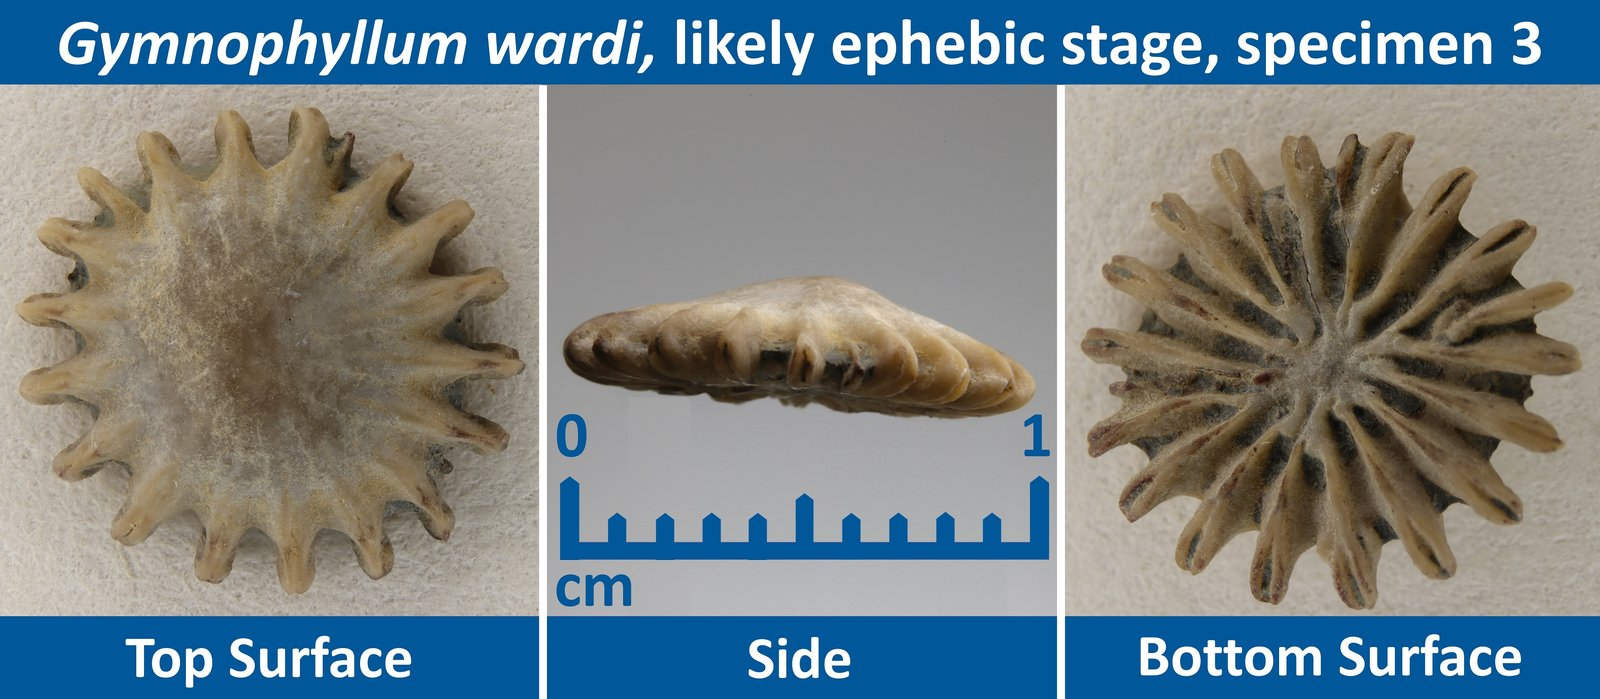 05 Gymnophyllum wardi Ephebic Specimen 03.jpg